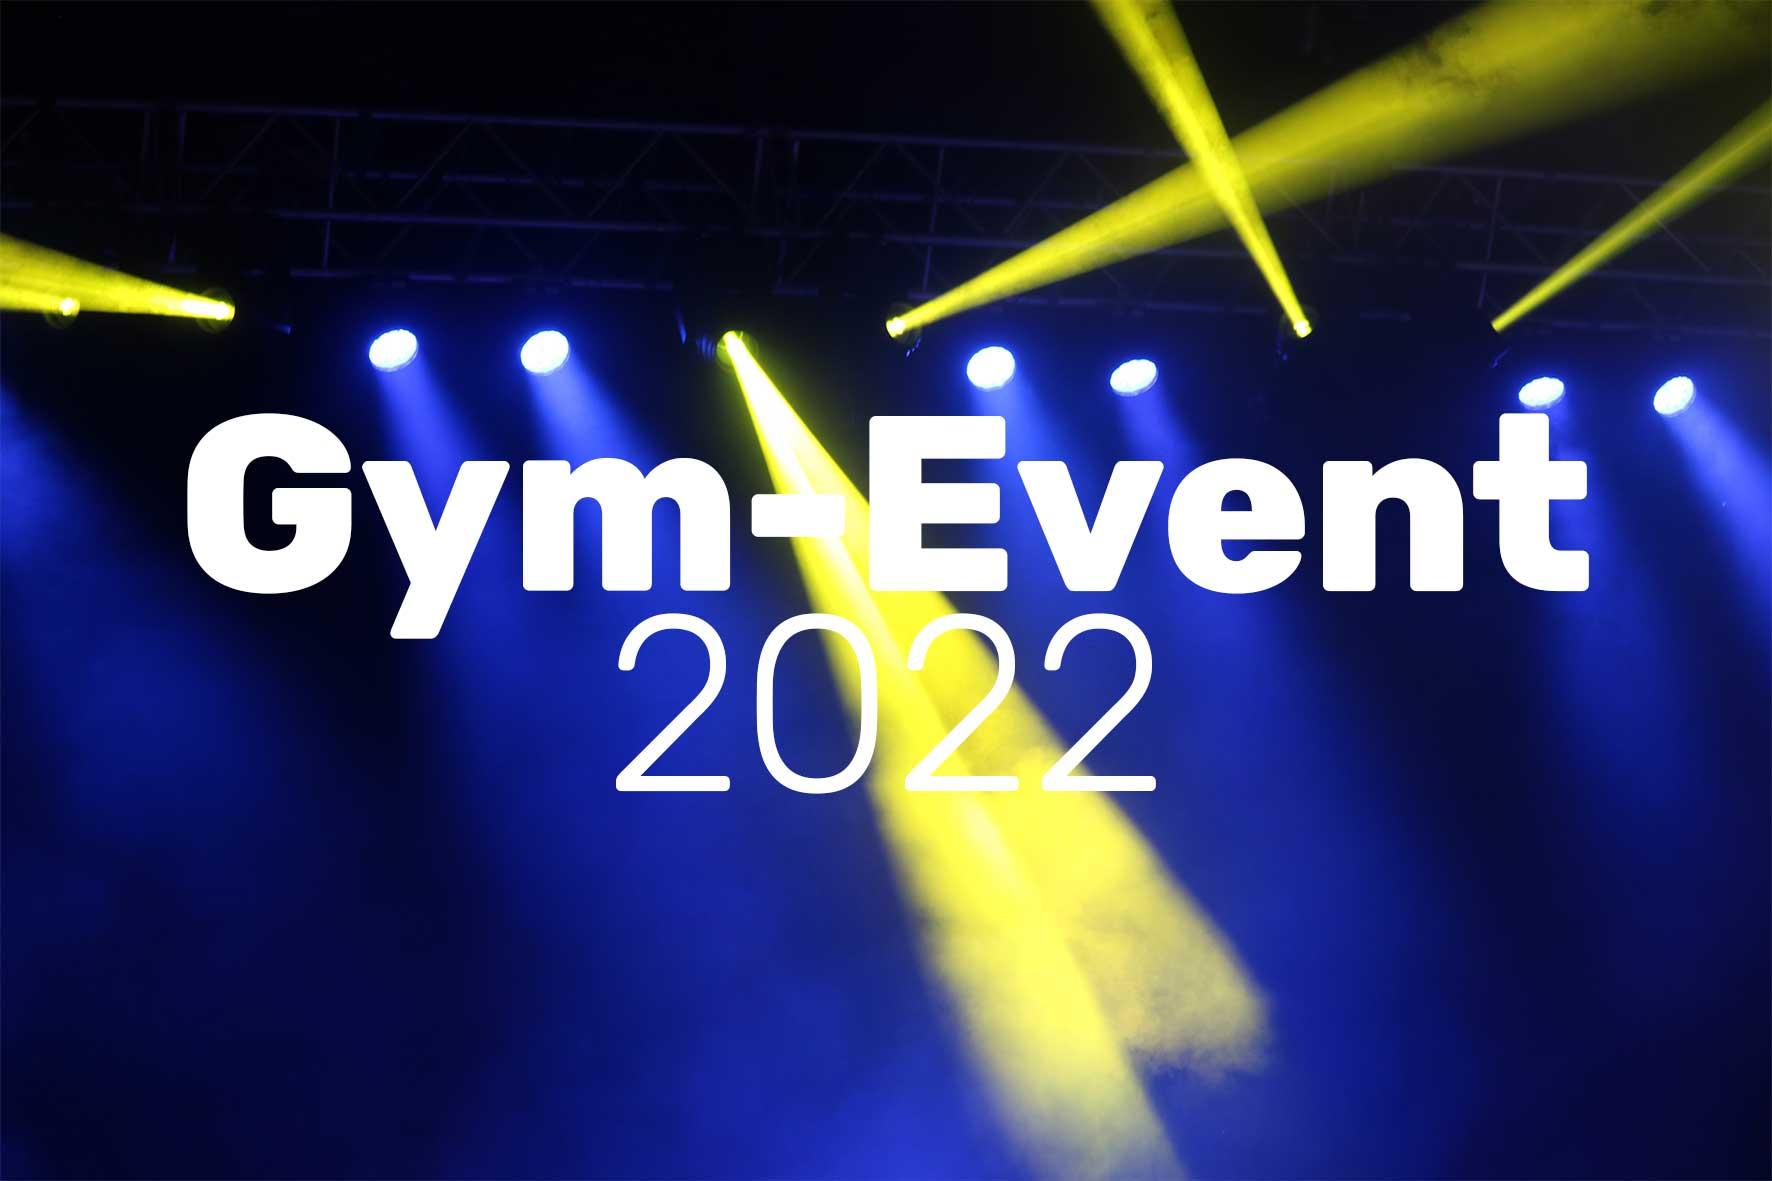 Gym-Event-2022-teaser-Volharding-Berchem-Het-Rooi